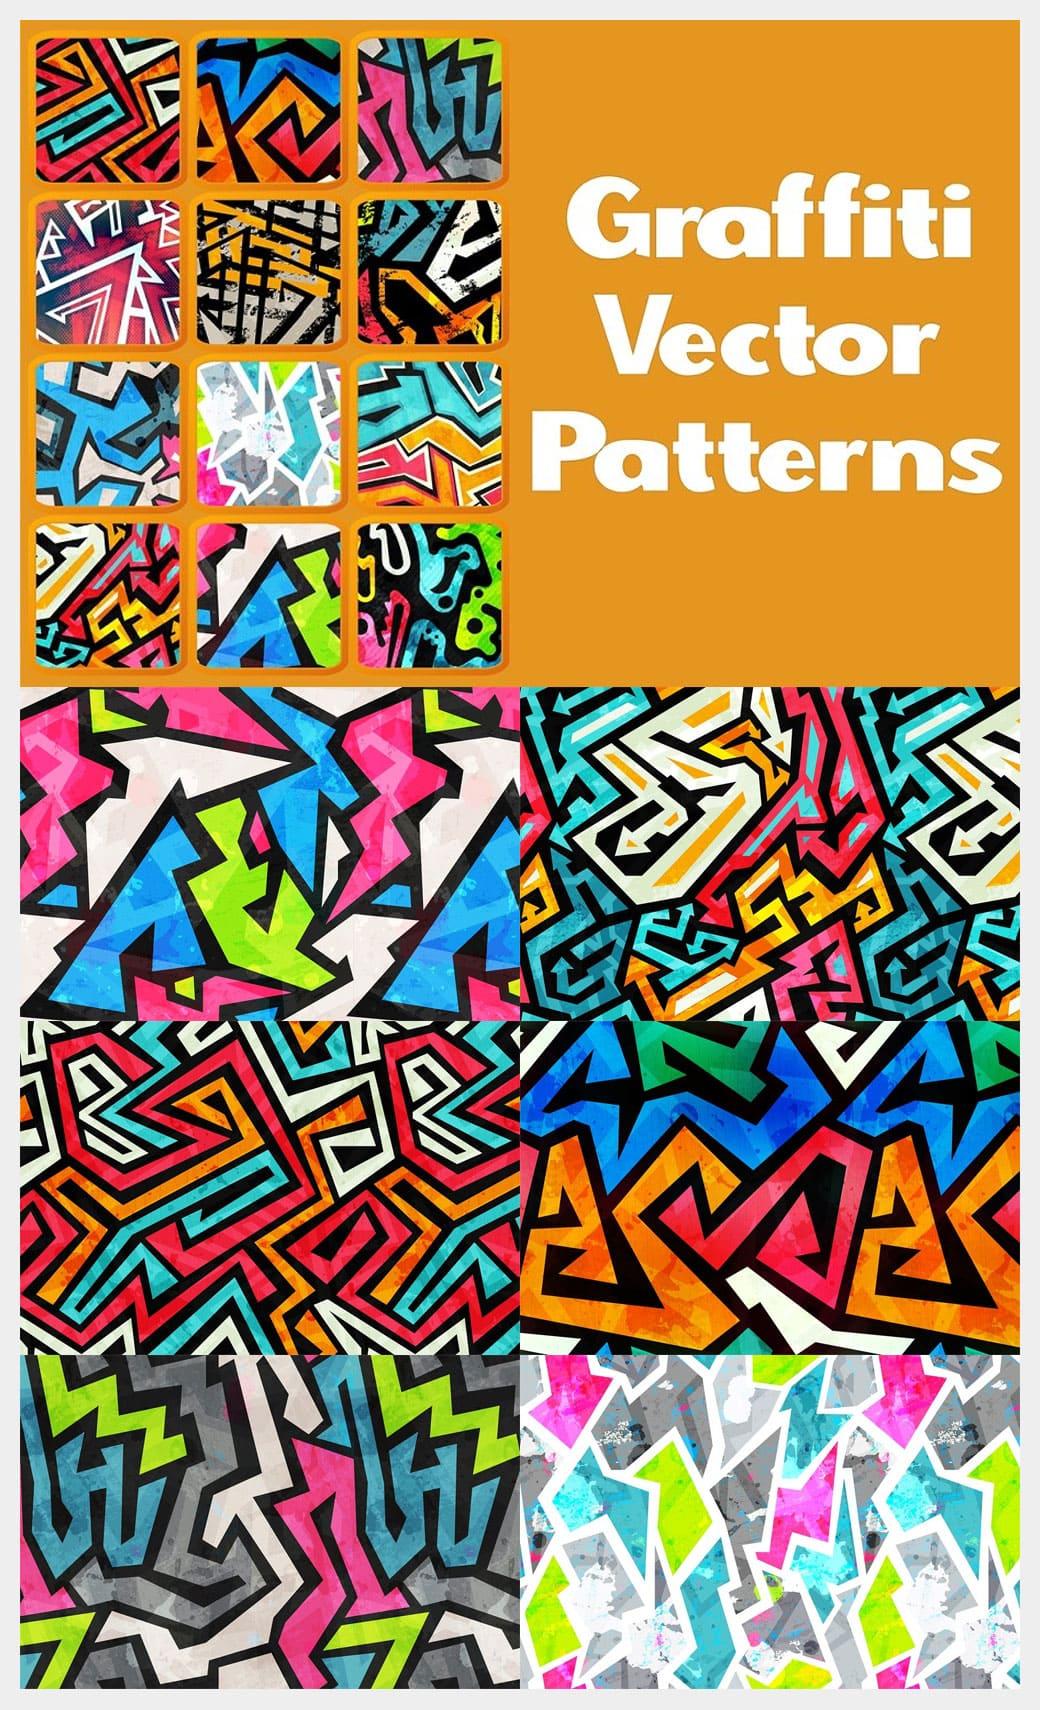 Graffiti vector patterns pack